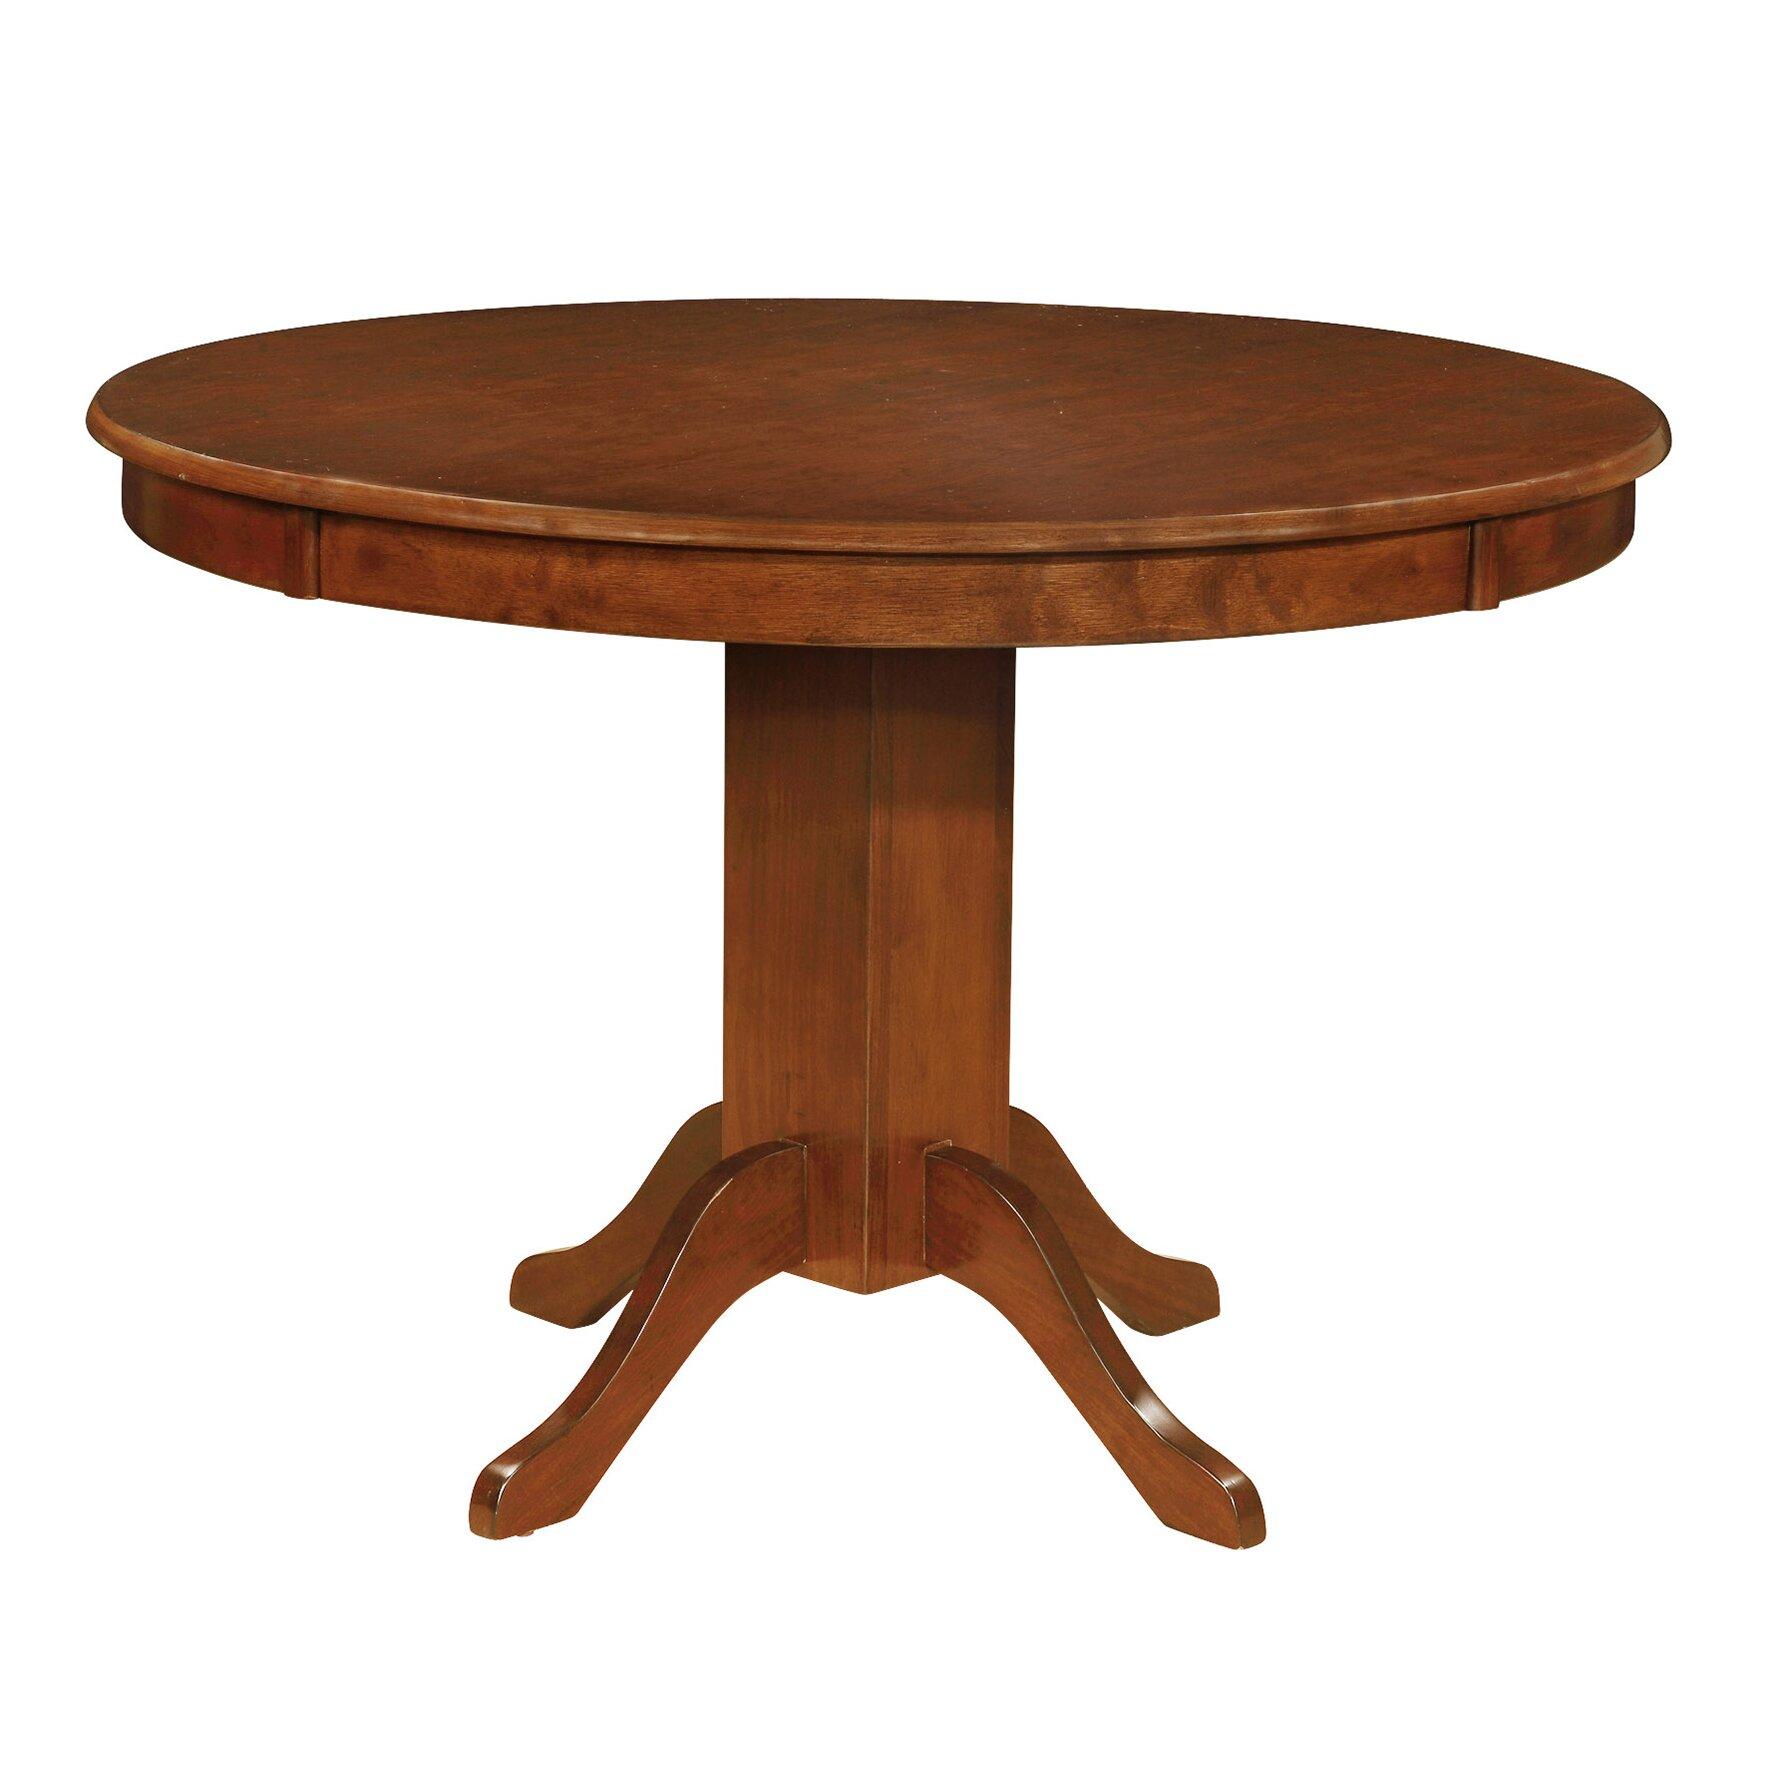 Wildon home r dining table reviews wayfair for Wayfair dining tables